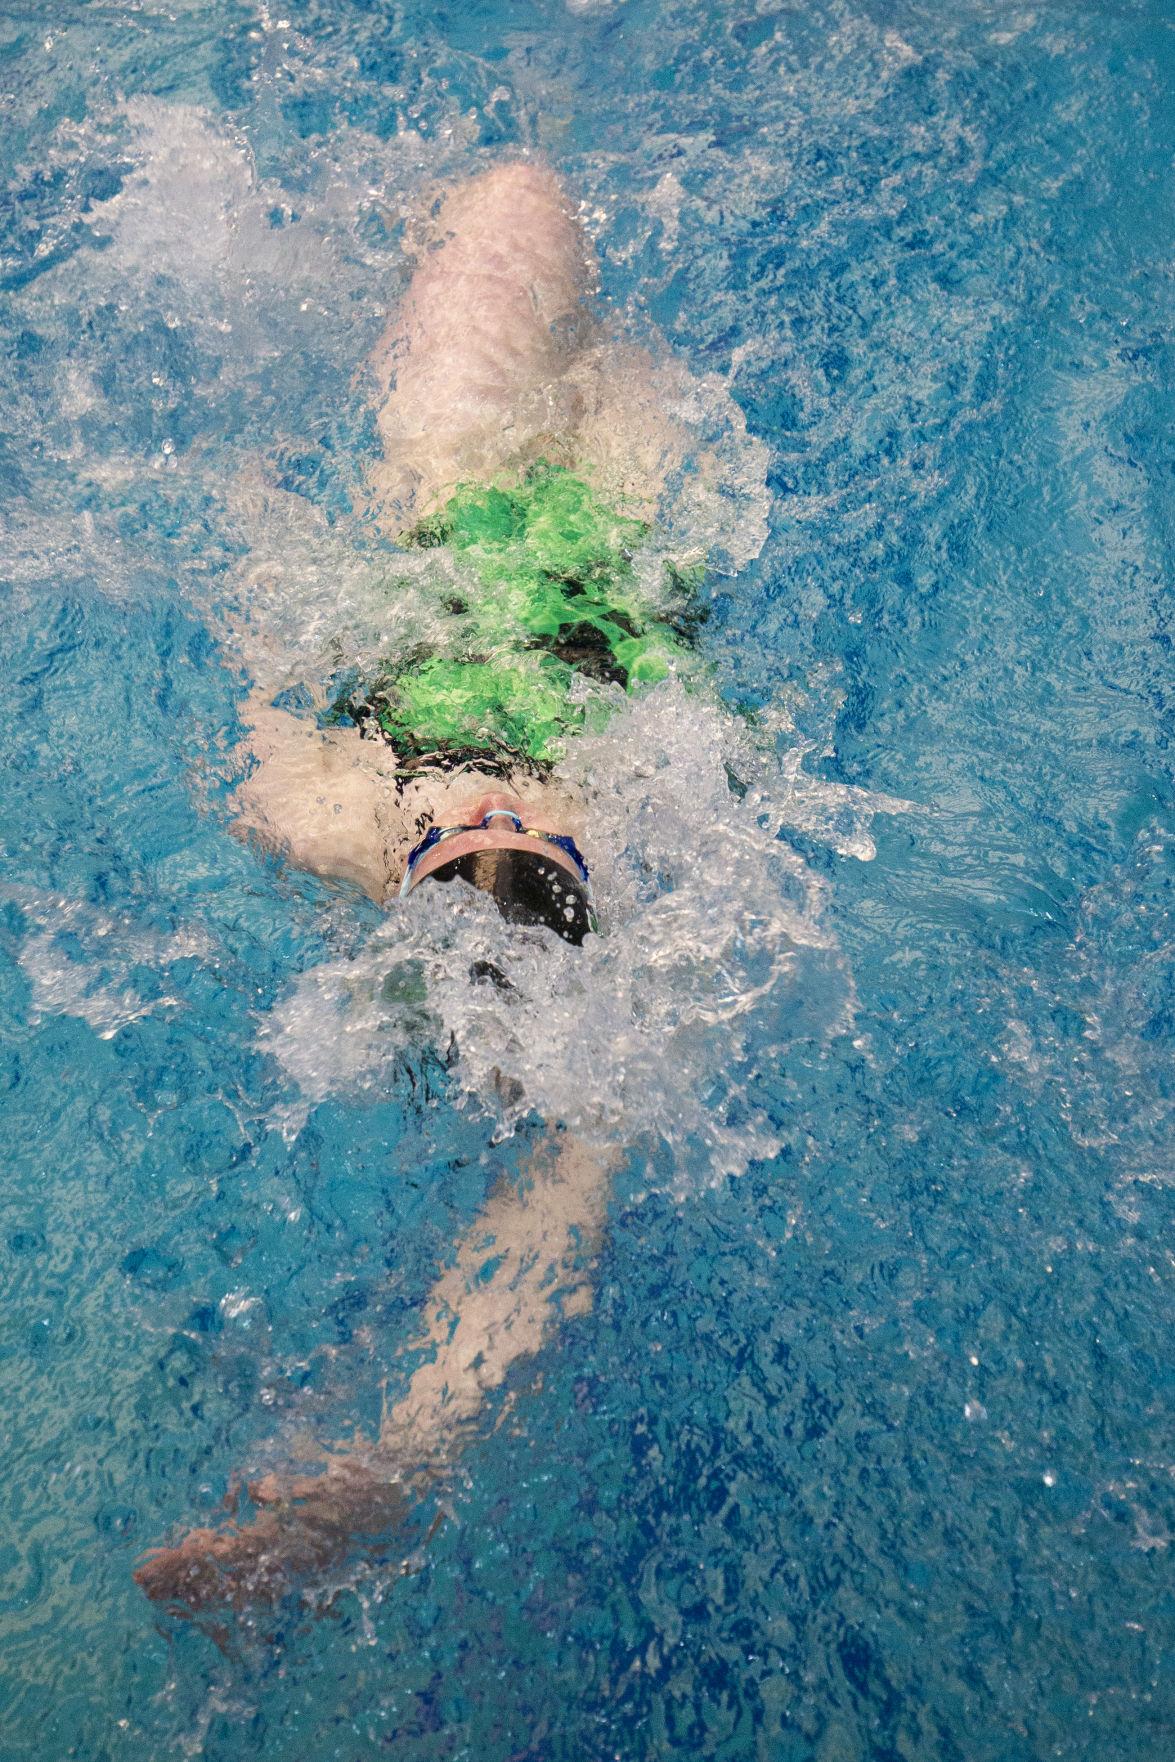 012019-s-preps-swimming